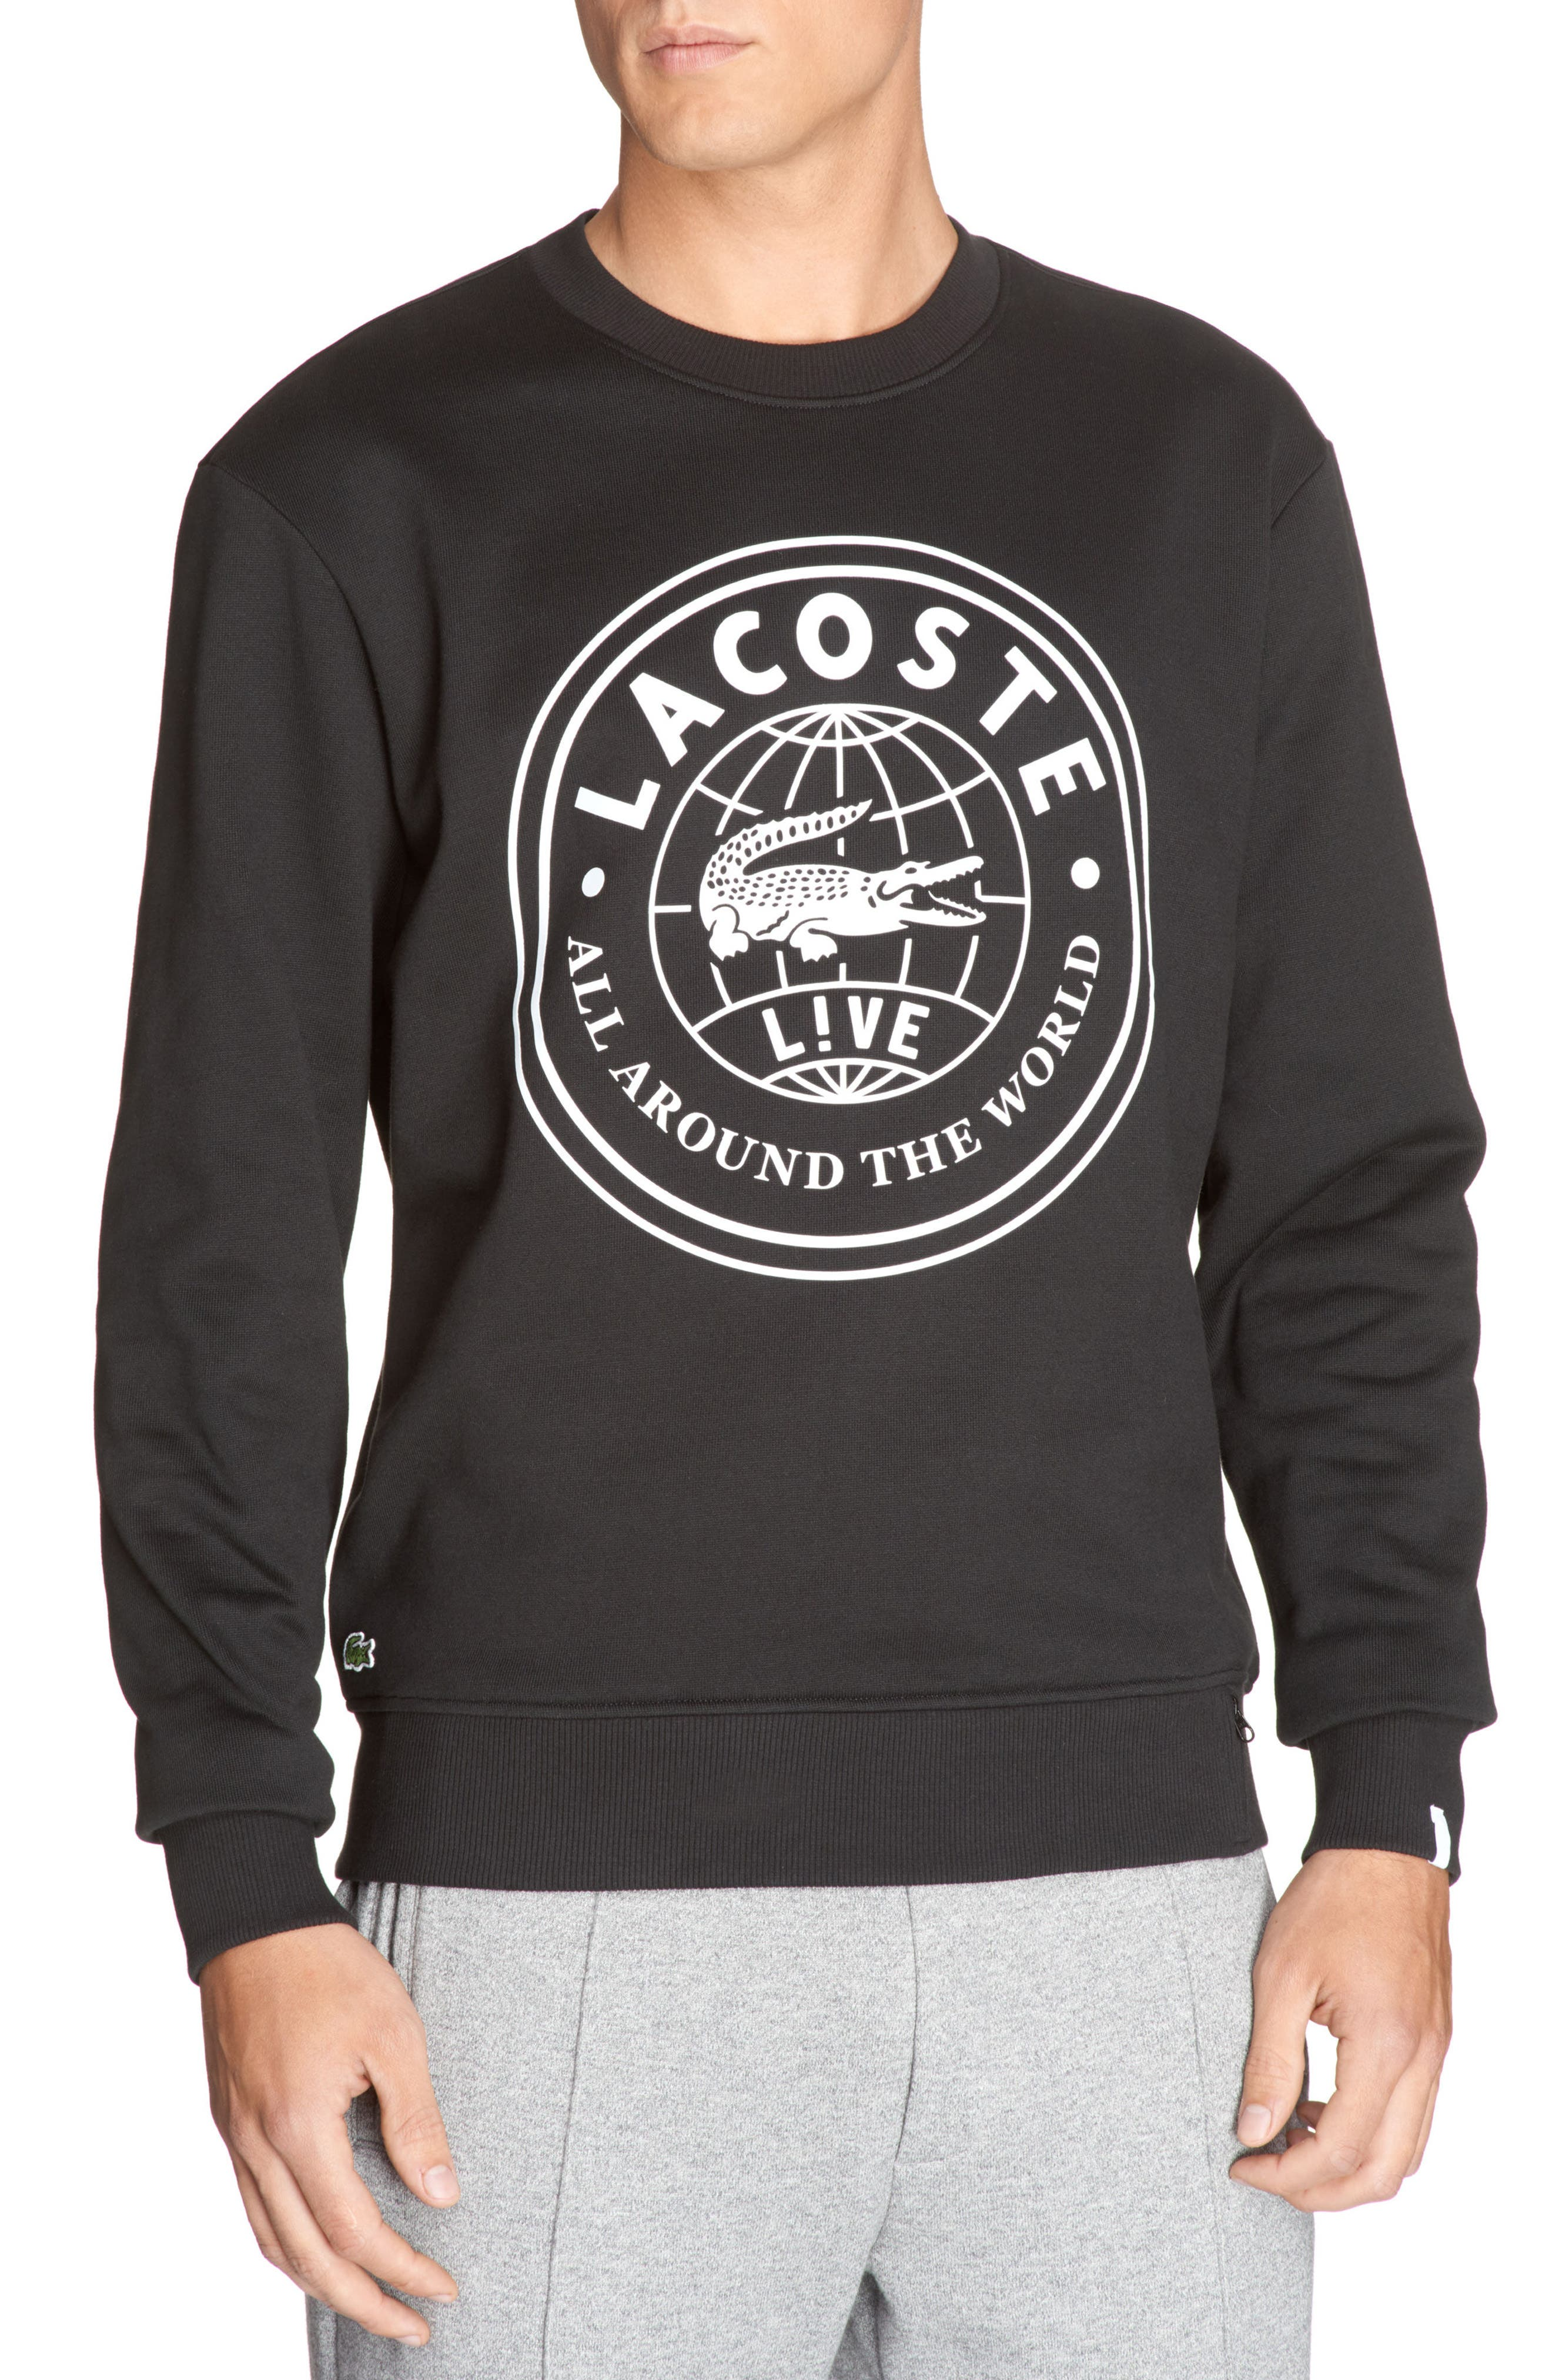 Molleton Worldwide Sweatshirt,                         Main,                         color, 258 Black/ White